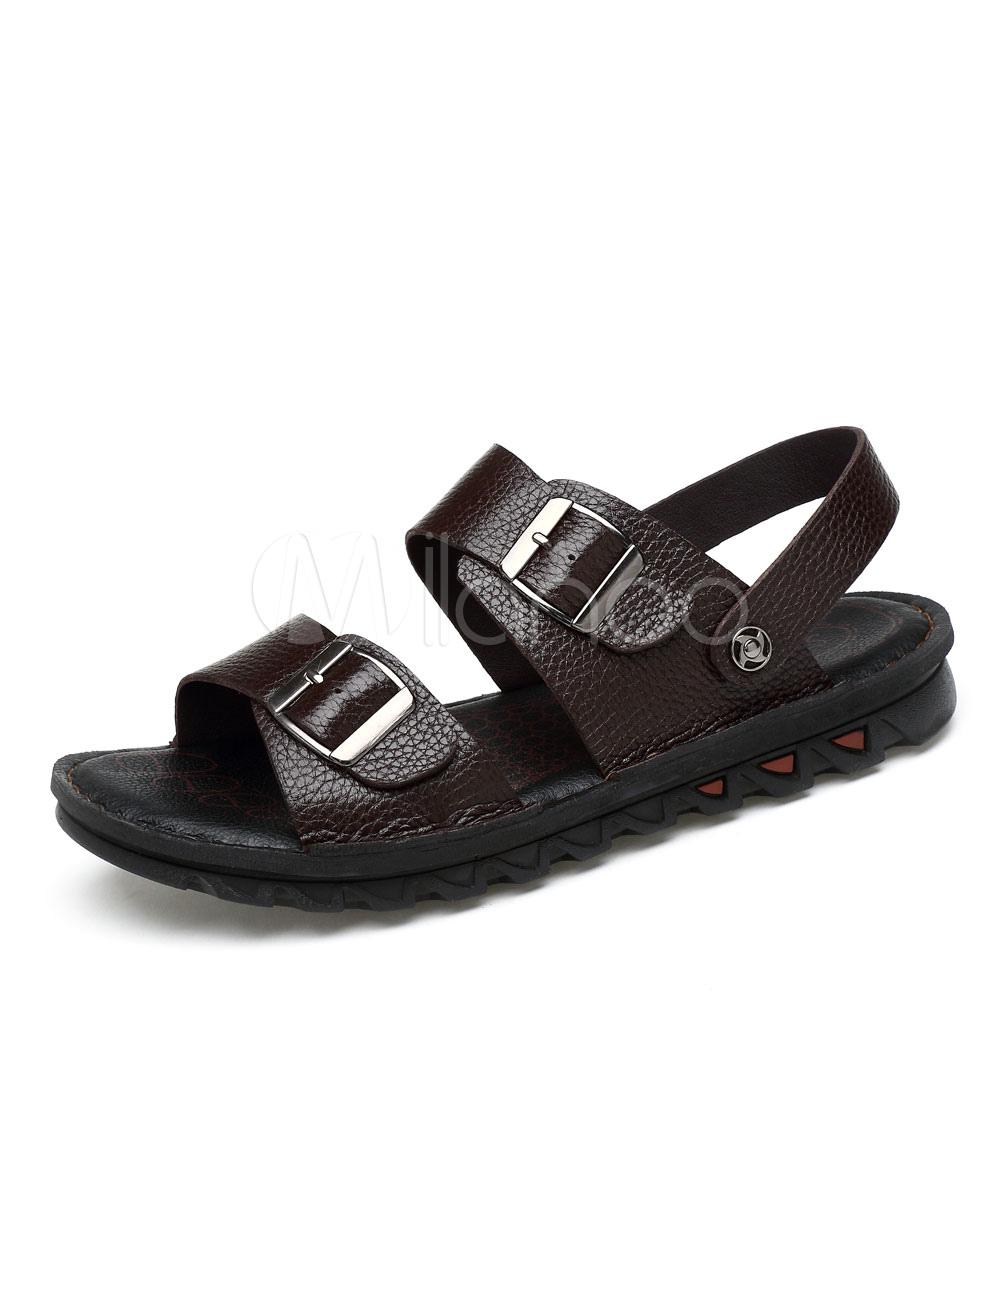 Buy Black Men Sandals Cowhide Open Toe Buckle Detail Flat Sandal Shoes Sandal Slippers for $38.24 in Milanoo store